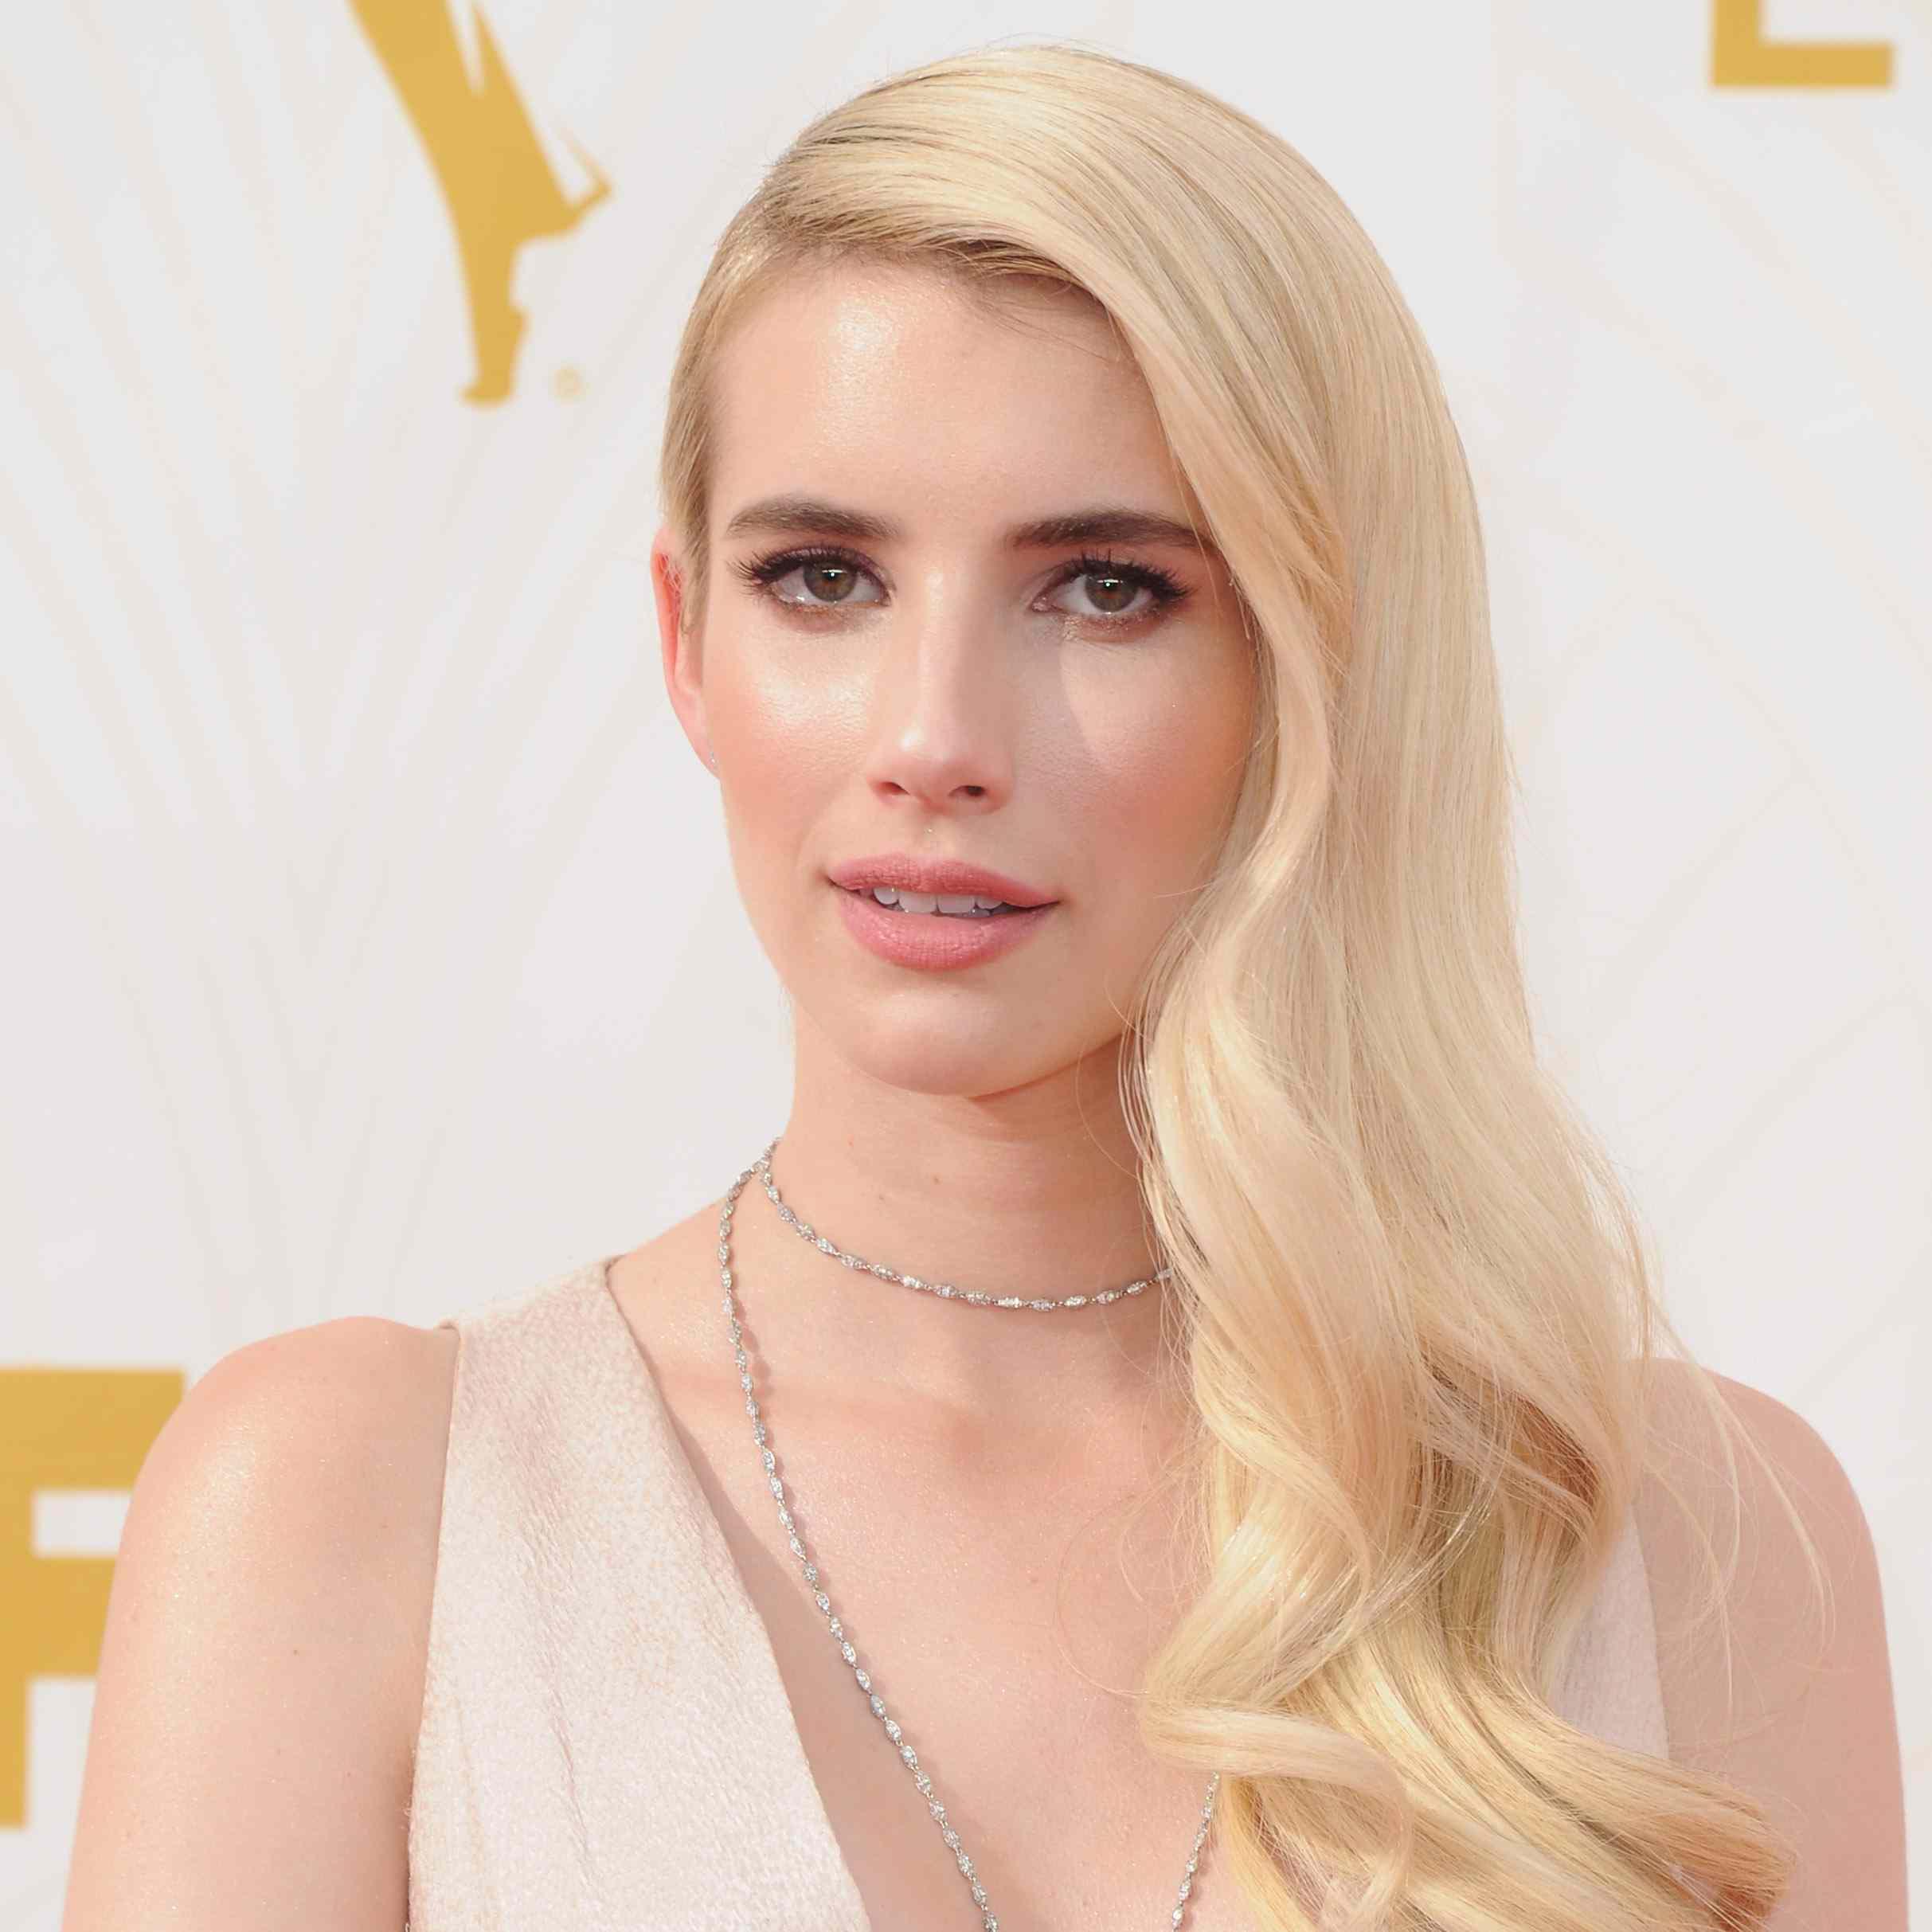 Celebrity Wedding Etiquette: 7 Celebrity Wedding Makeup Looks & How To Create Them